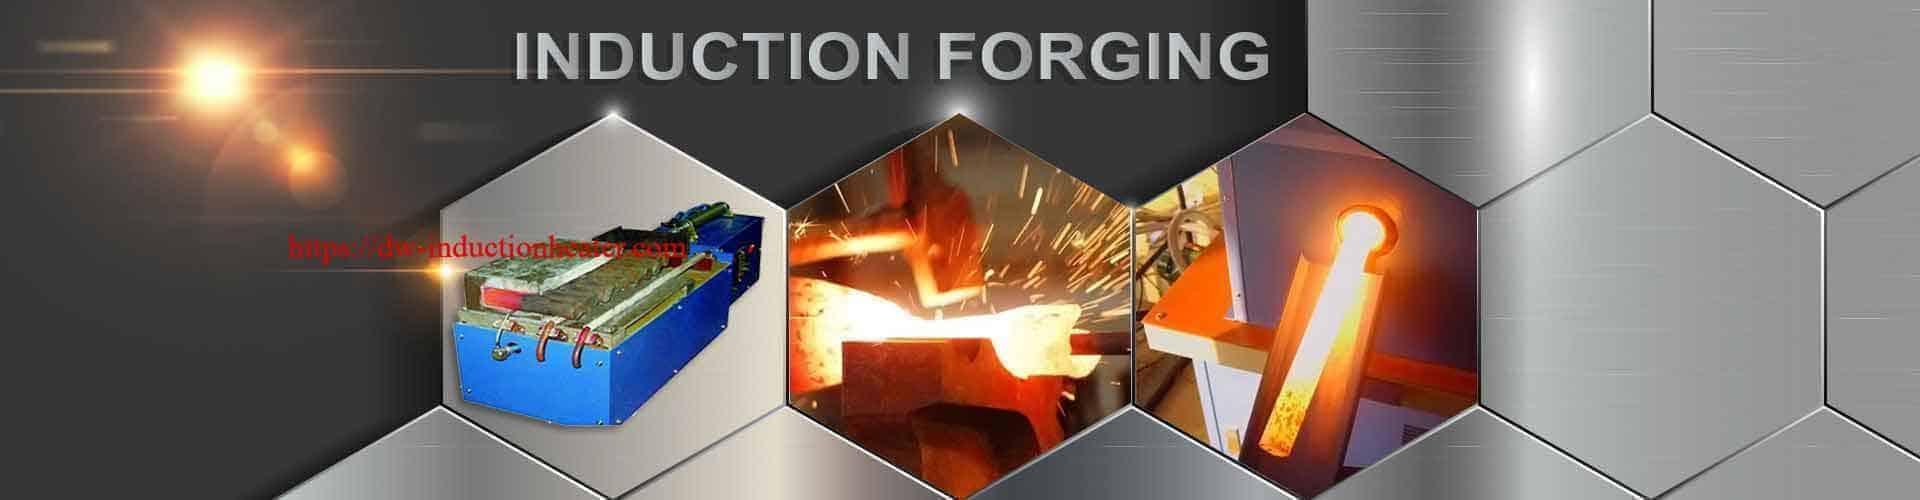 induction-hot-forging-furnace